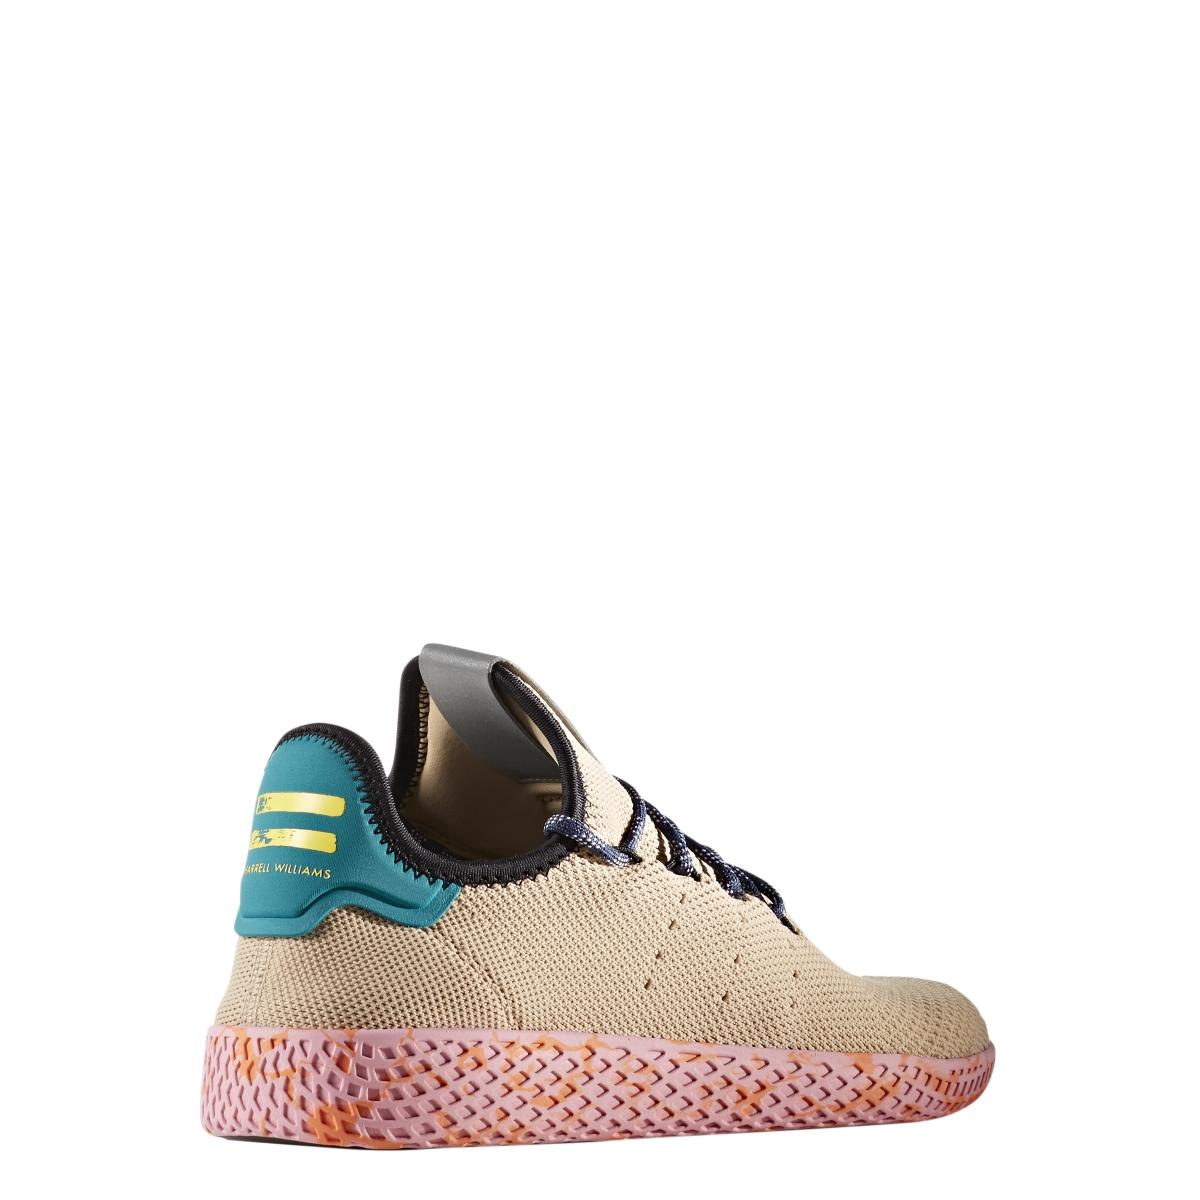 b10bc9fe6 Adidas X Pharrell Williams Tennis Hu in Tan Teal Pink Marble — MAJOR